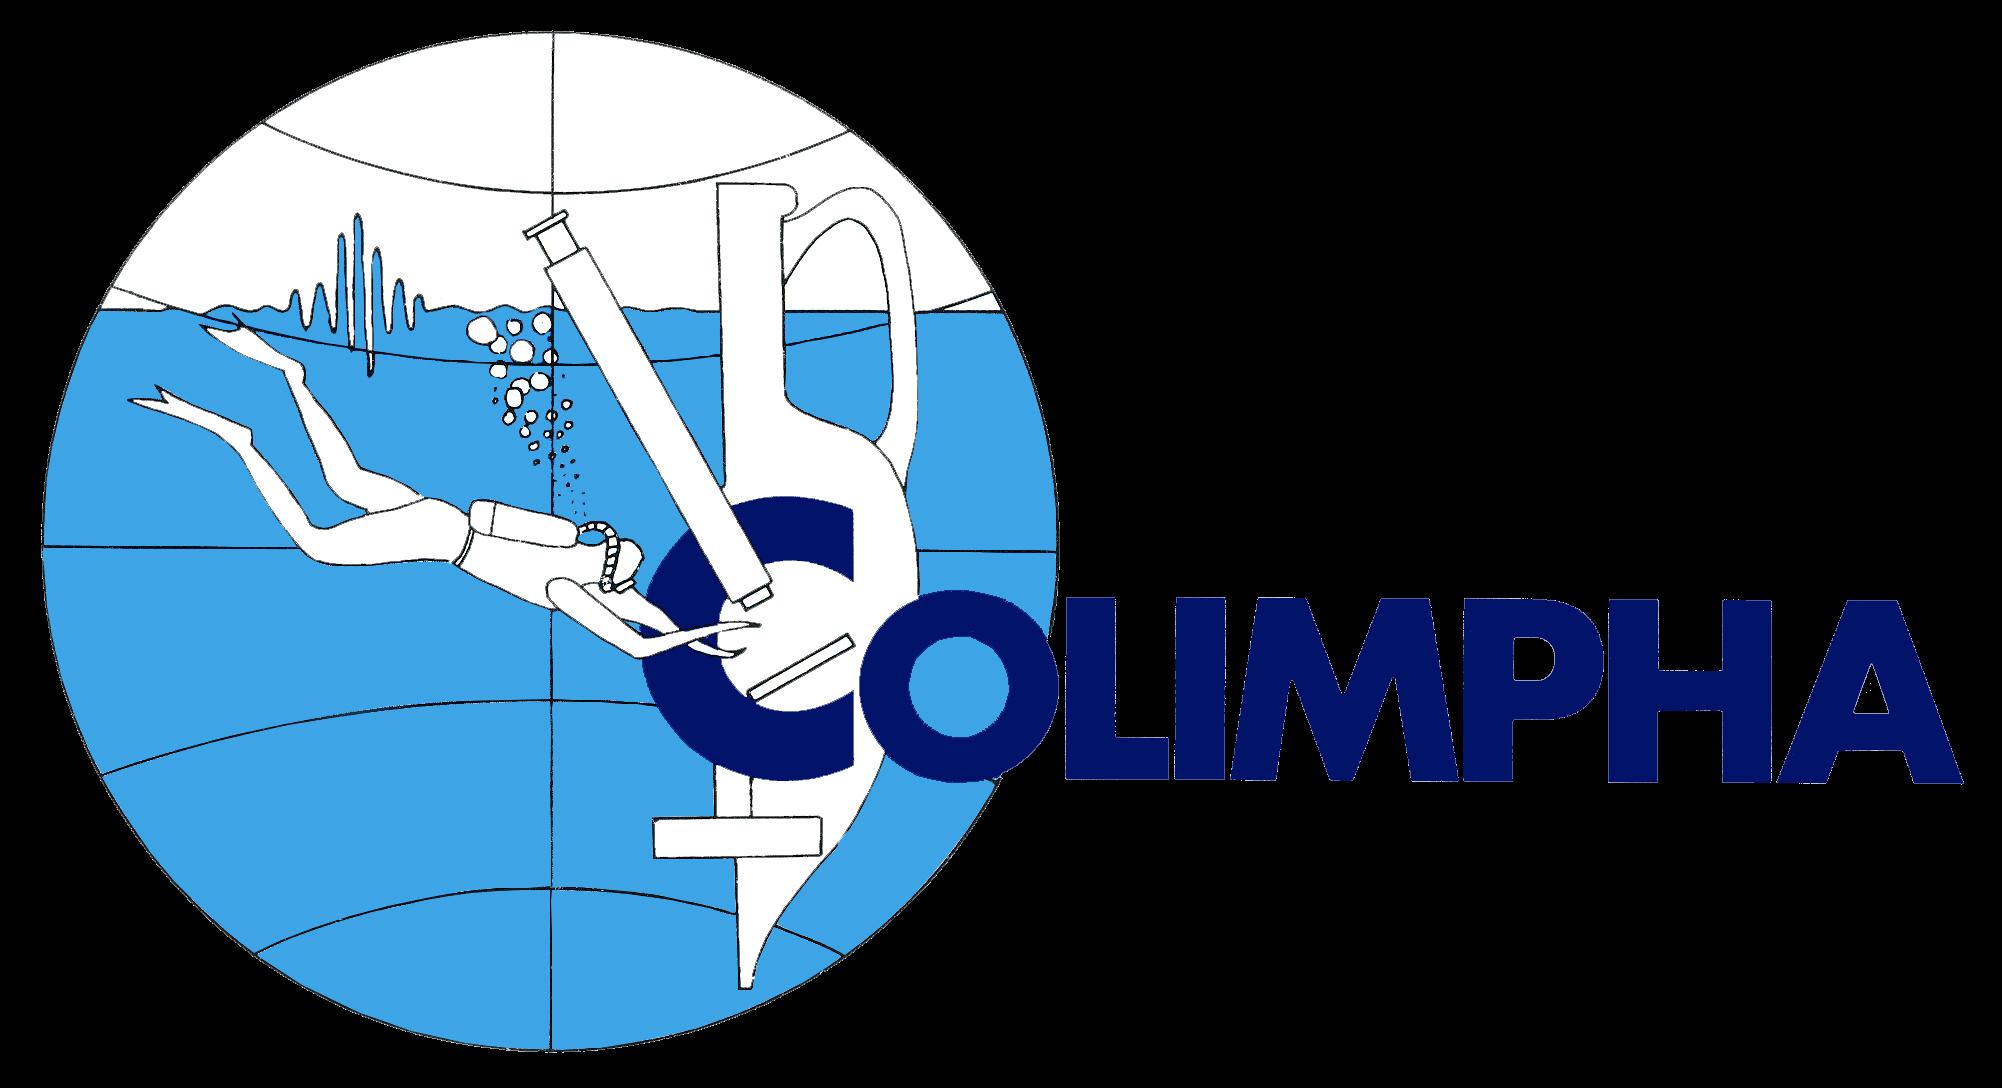 Colimpha